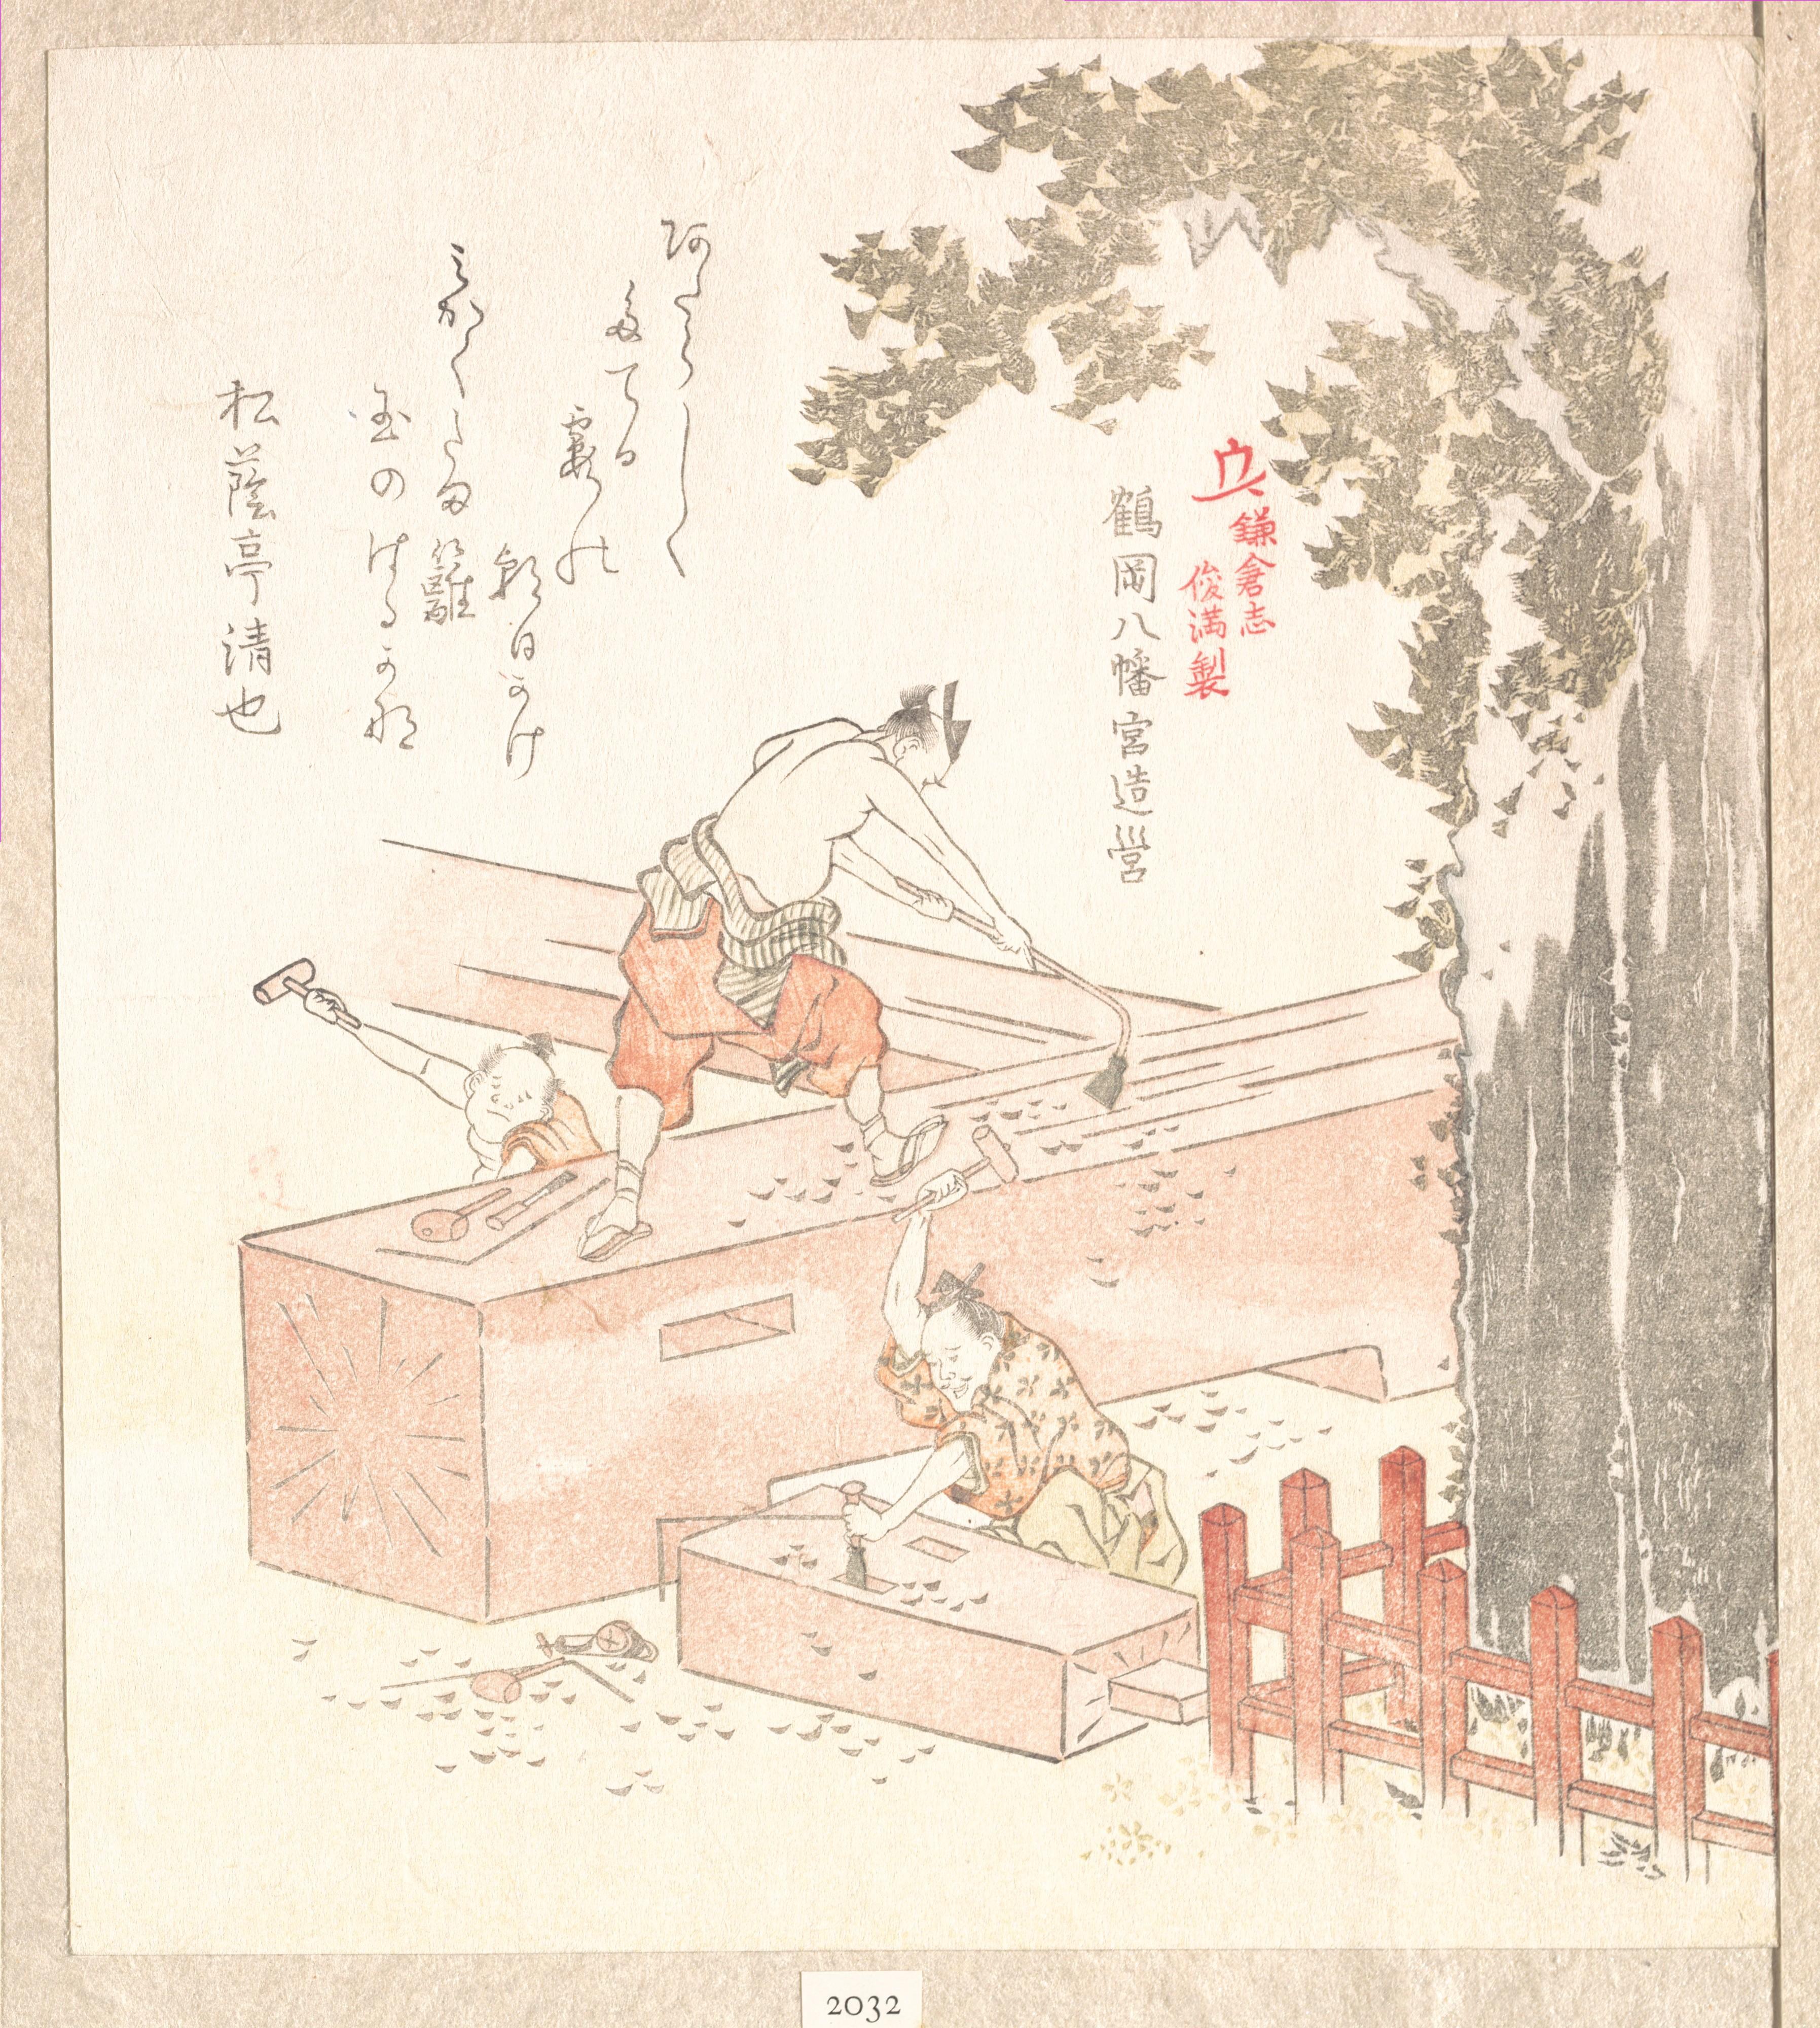 История Камакура. Строительство святилища Цуругаока Хатиман_205х184 мм